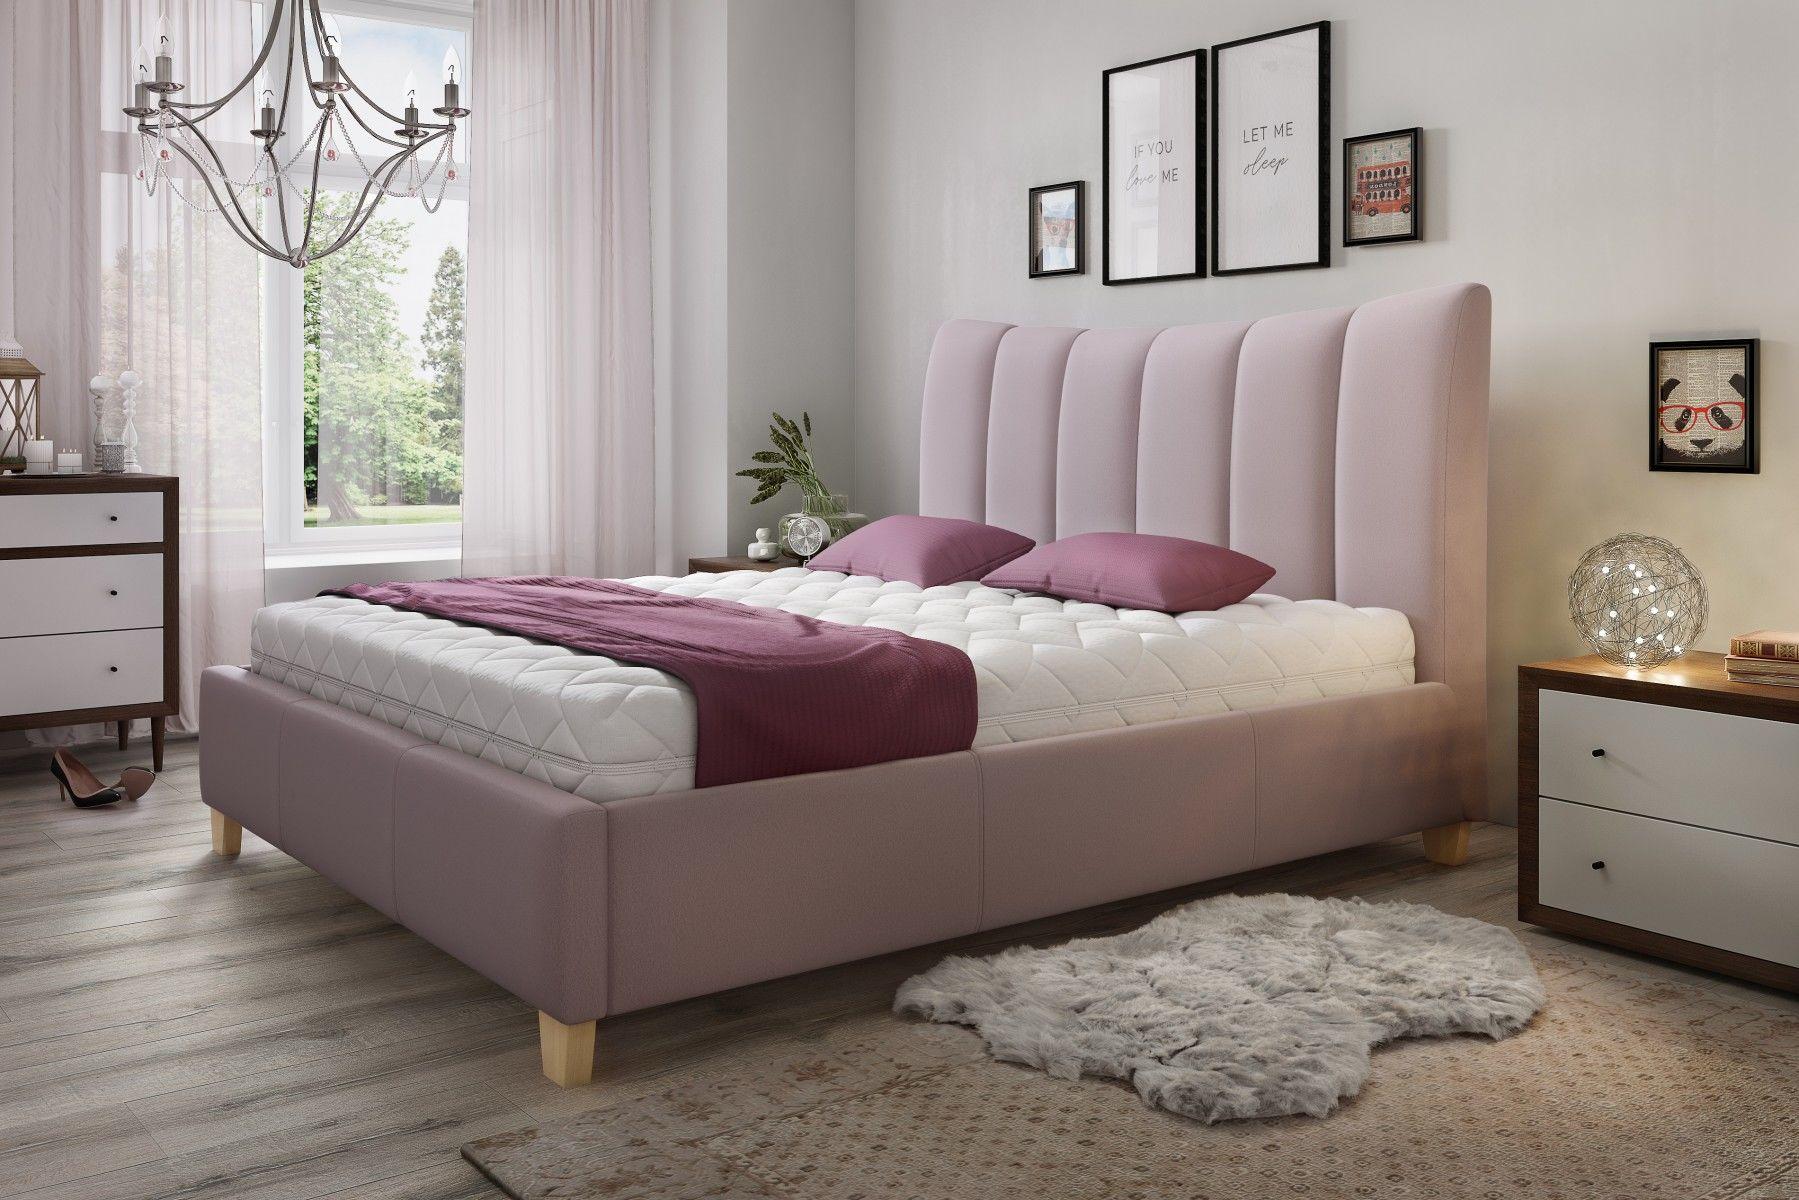 Łóżko art deco